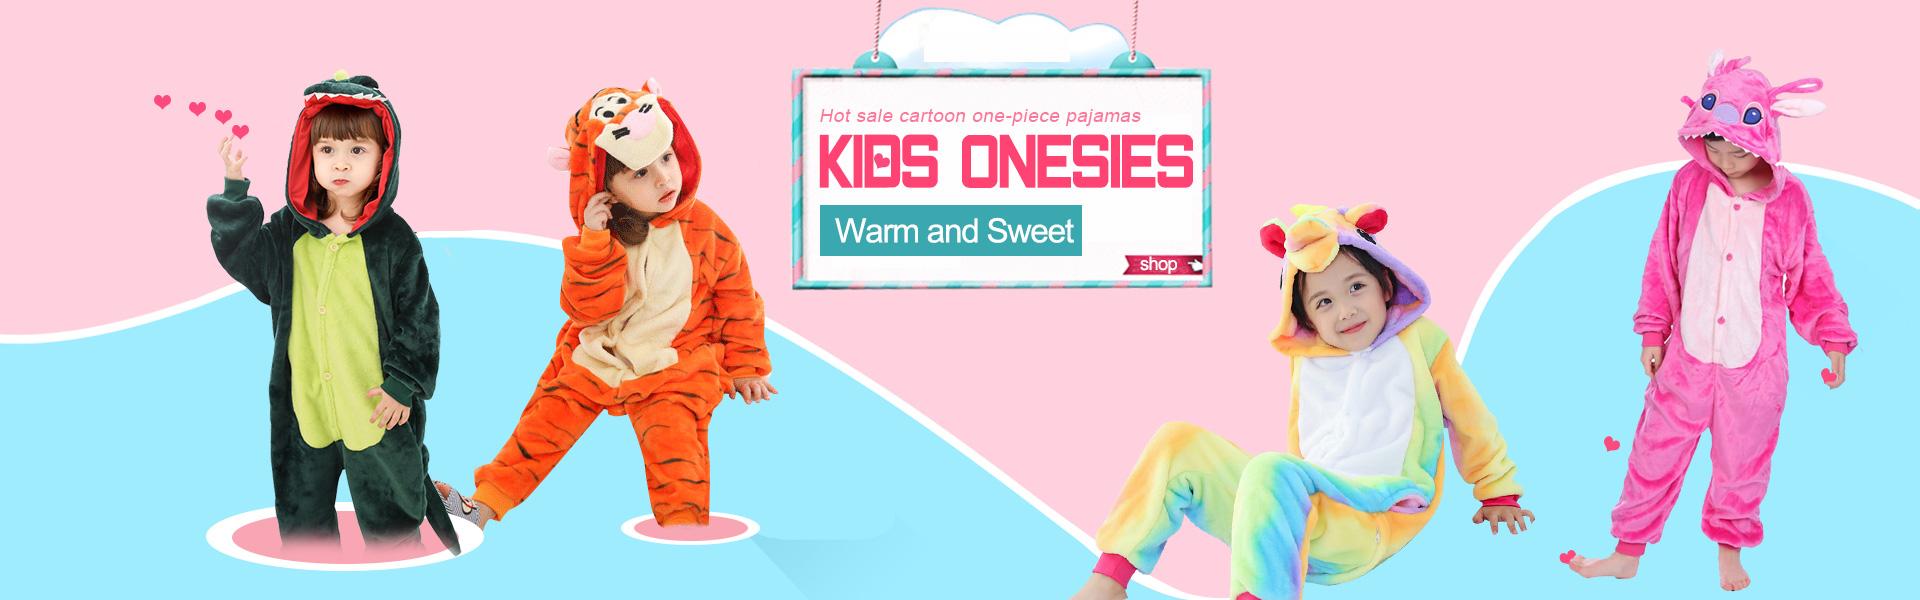 Safe and Comfortable kids kigurumi onesie pajamas with fast shipping.